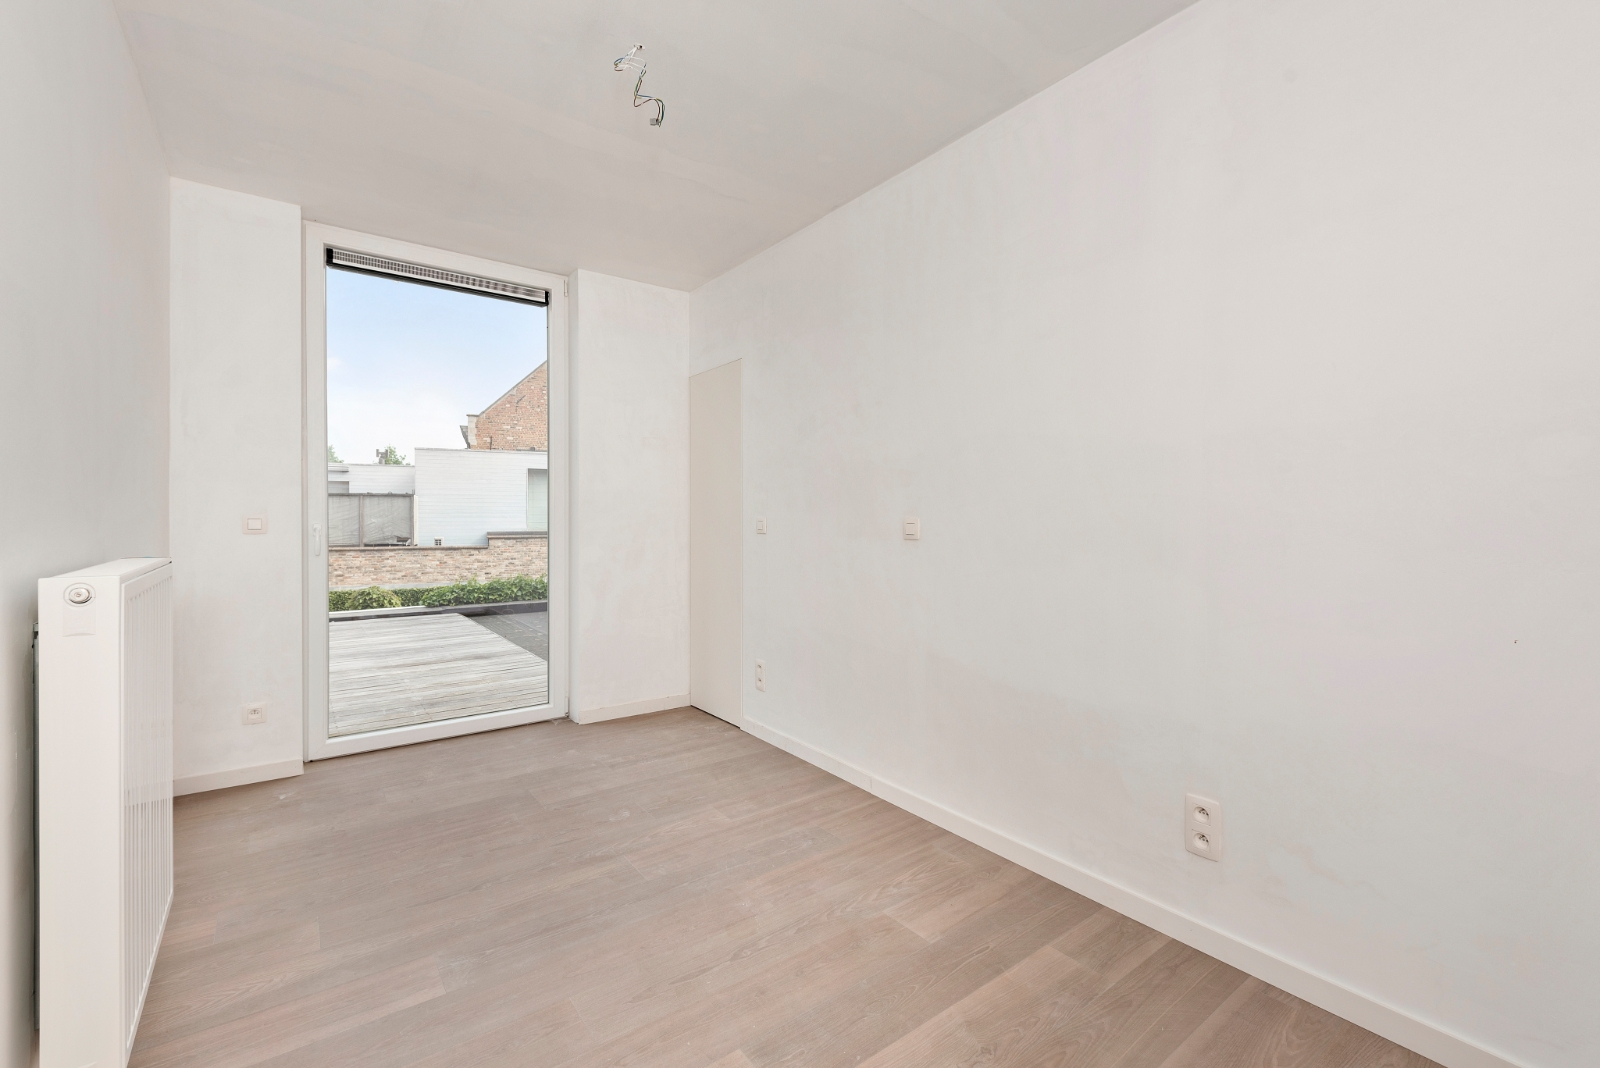 Prachtig appartement met super ruim terras in centrum Diksmuide - 6